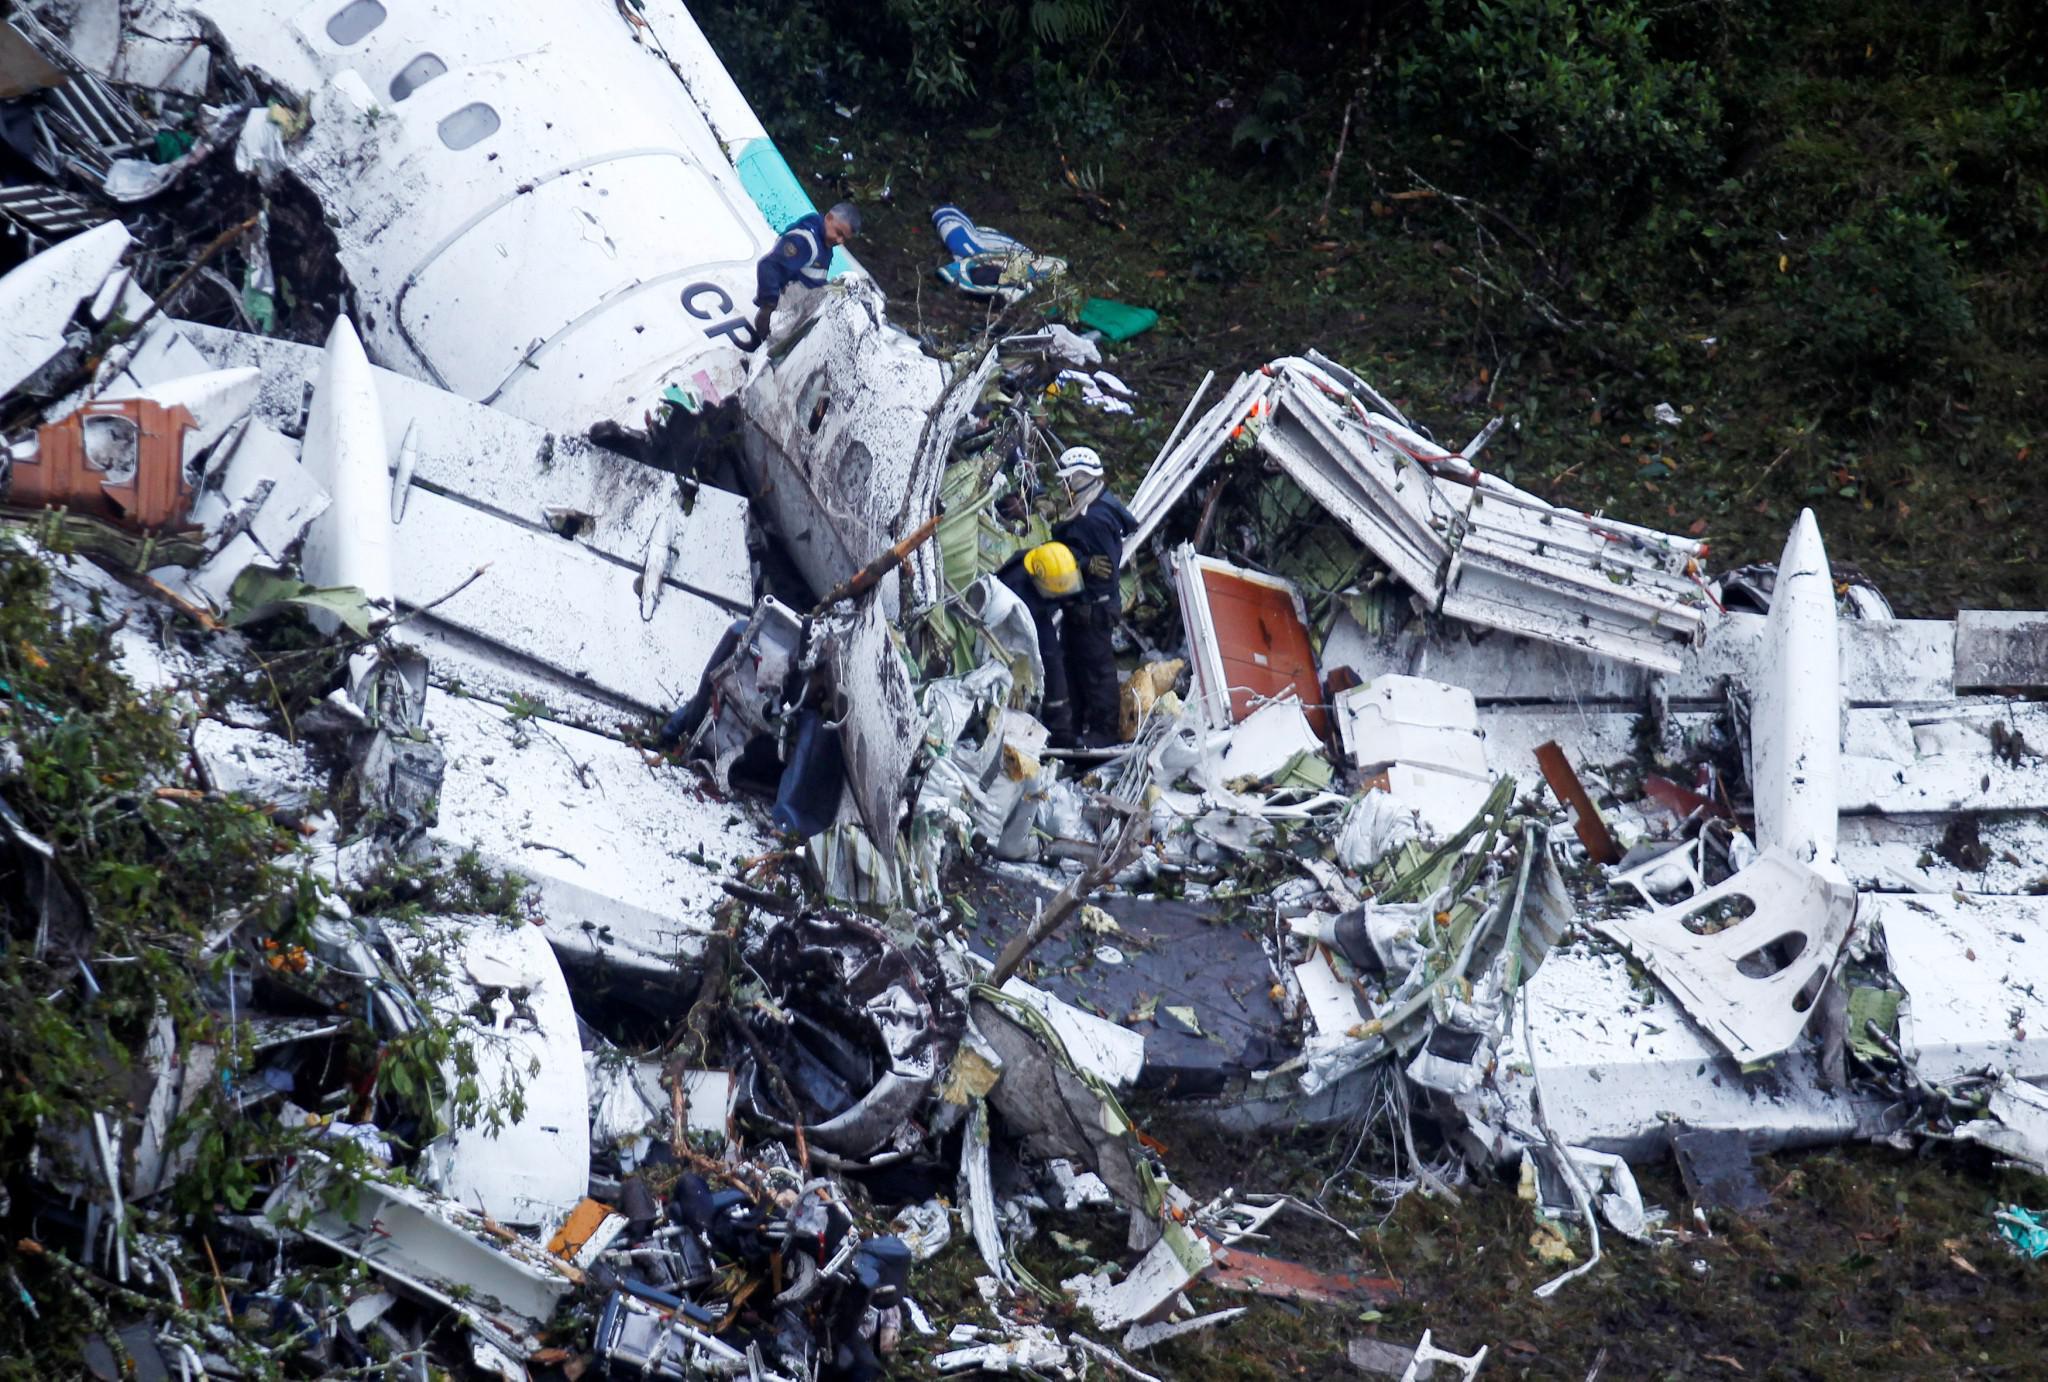 tragodia-aeroporiko-dustixima-kolomvia-nekroi-1300-2 71 είναι οι νεκροί από την αεροπορική τραγωδία στην Κολομβία- 4 δεν επιβιβάστηκαν στο αεροπλάνο